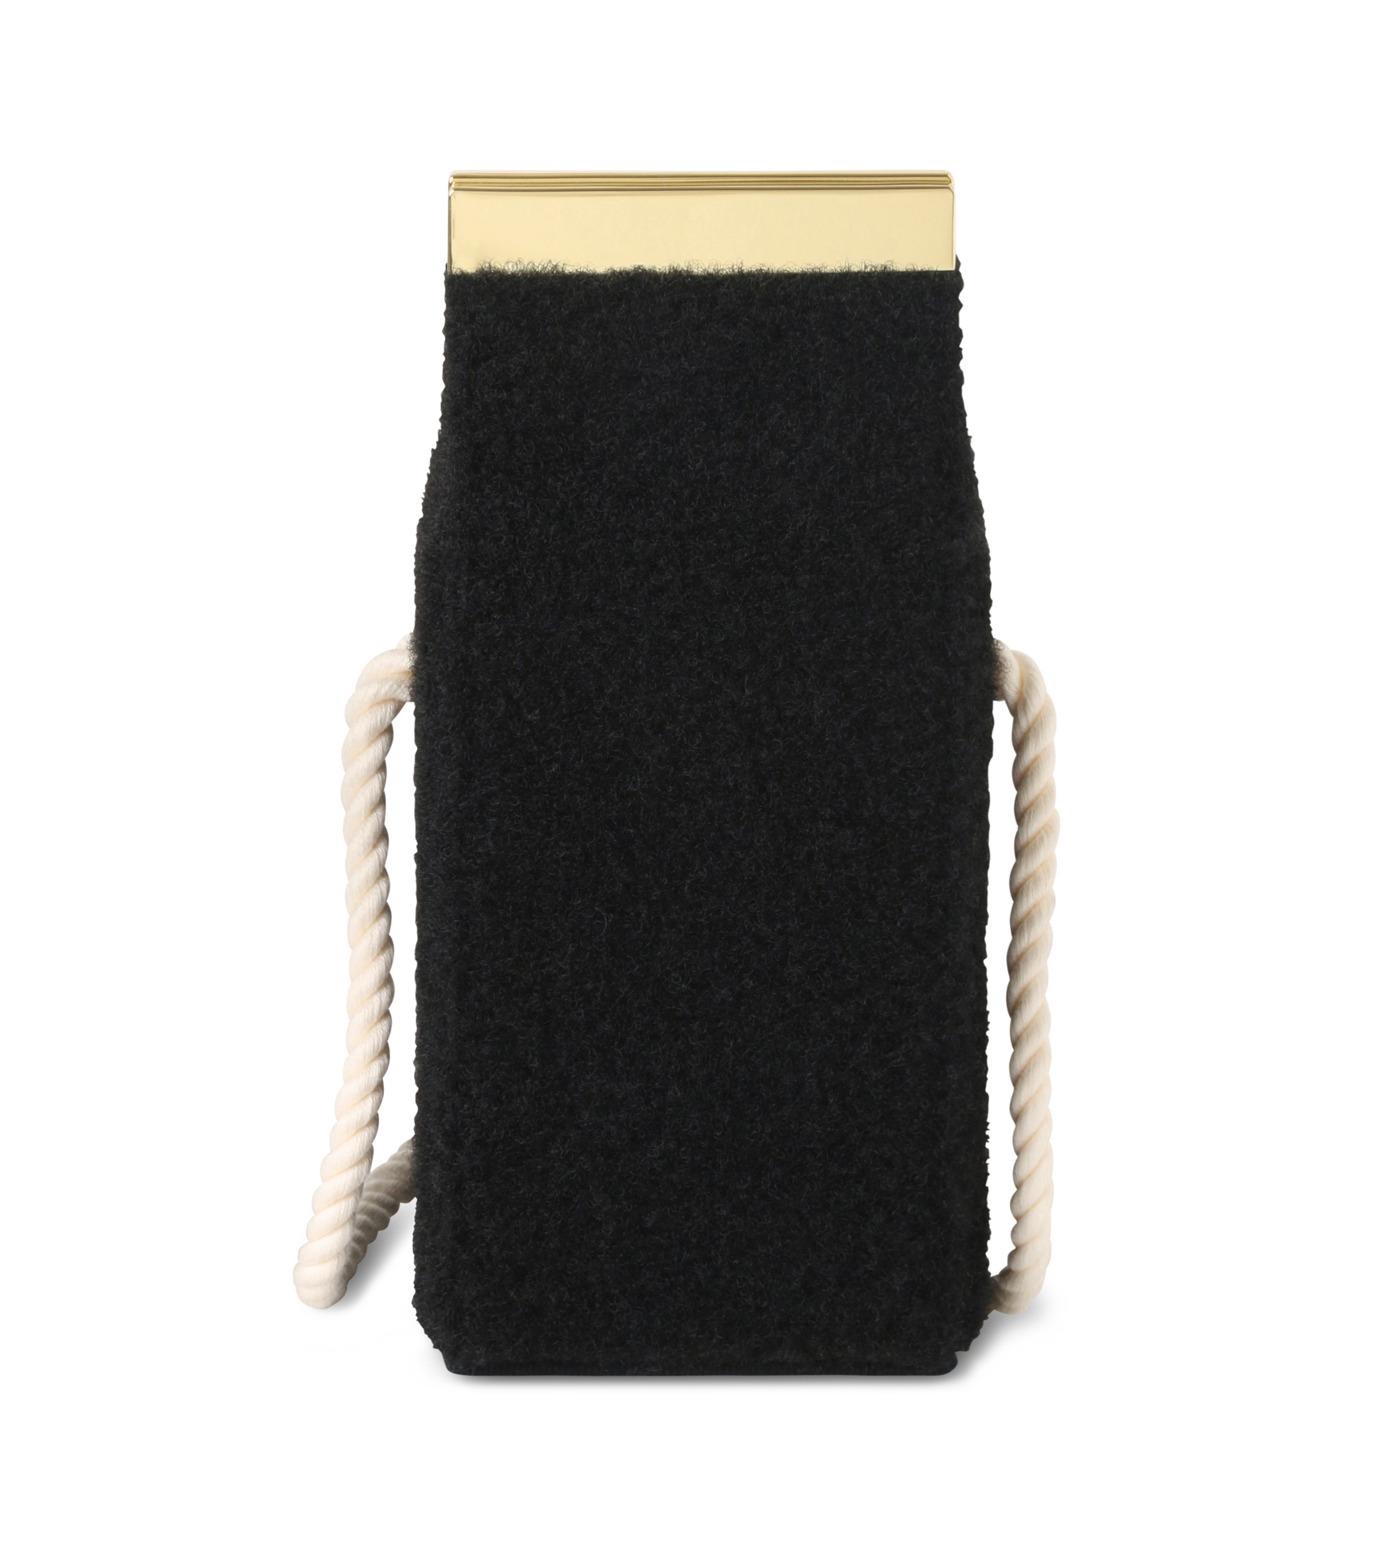 Olympia Le-Tan(オリンピア ルタン)のVelcro Milk Box-BLACK(ショルダーバッグ/shoulder bag)-FW16BMB300-13 拡大詳細画像3